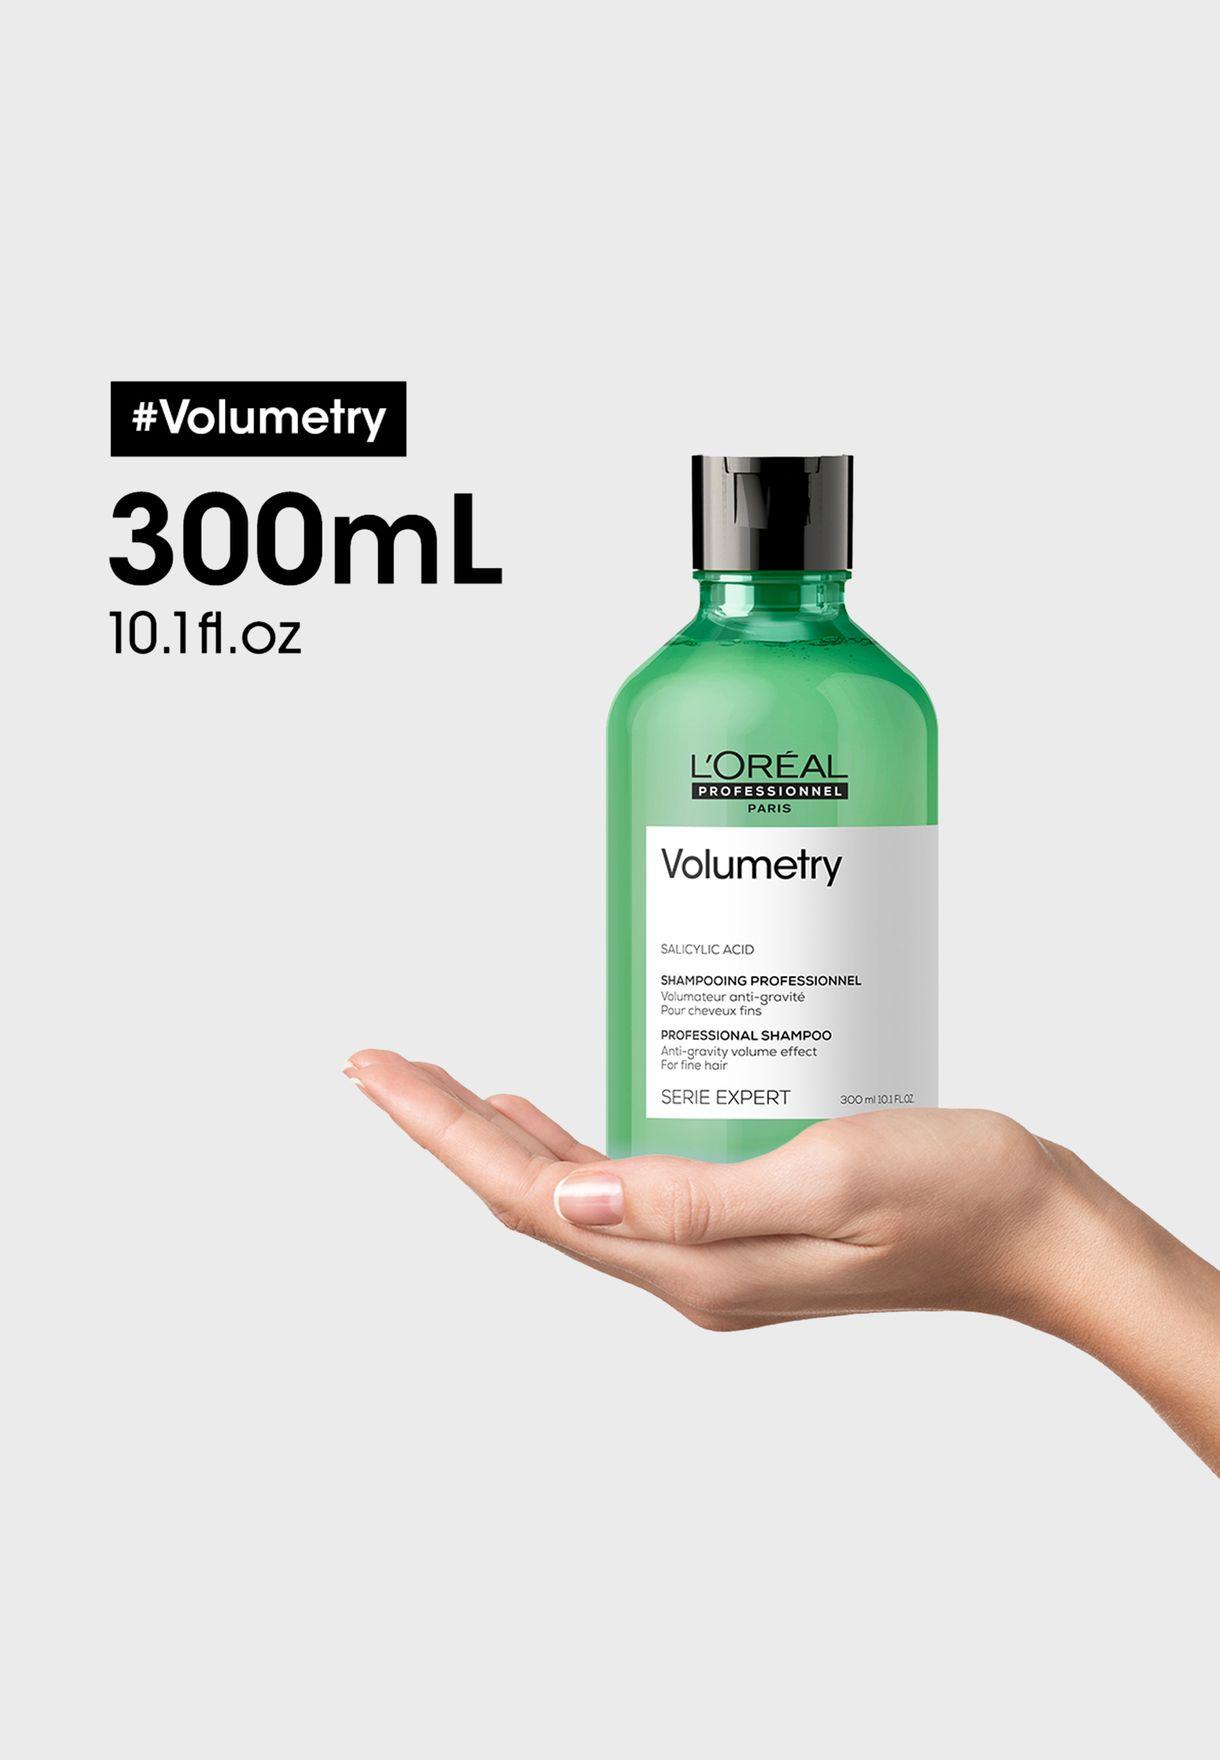 Serie Expert Volumetry Shampoo 300Ml